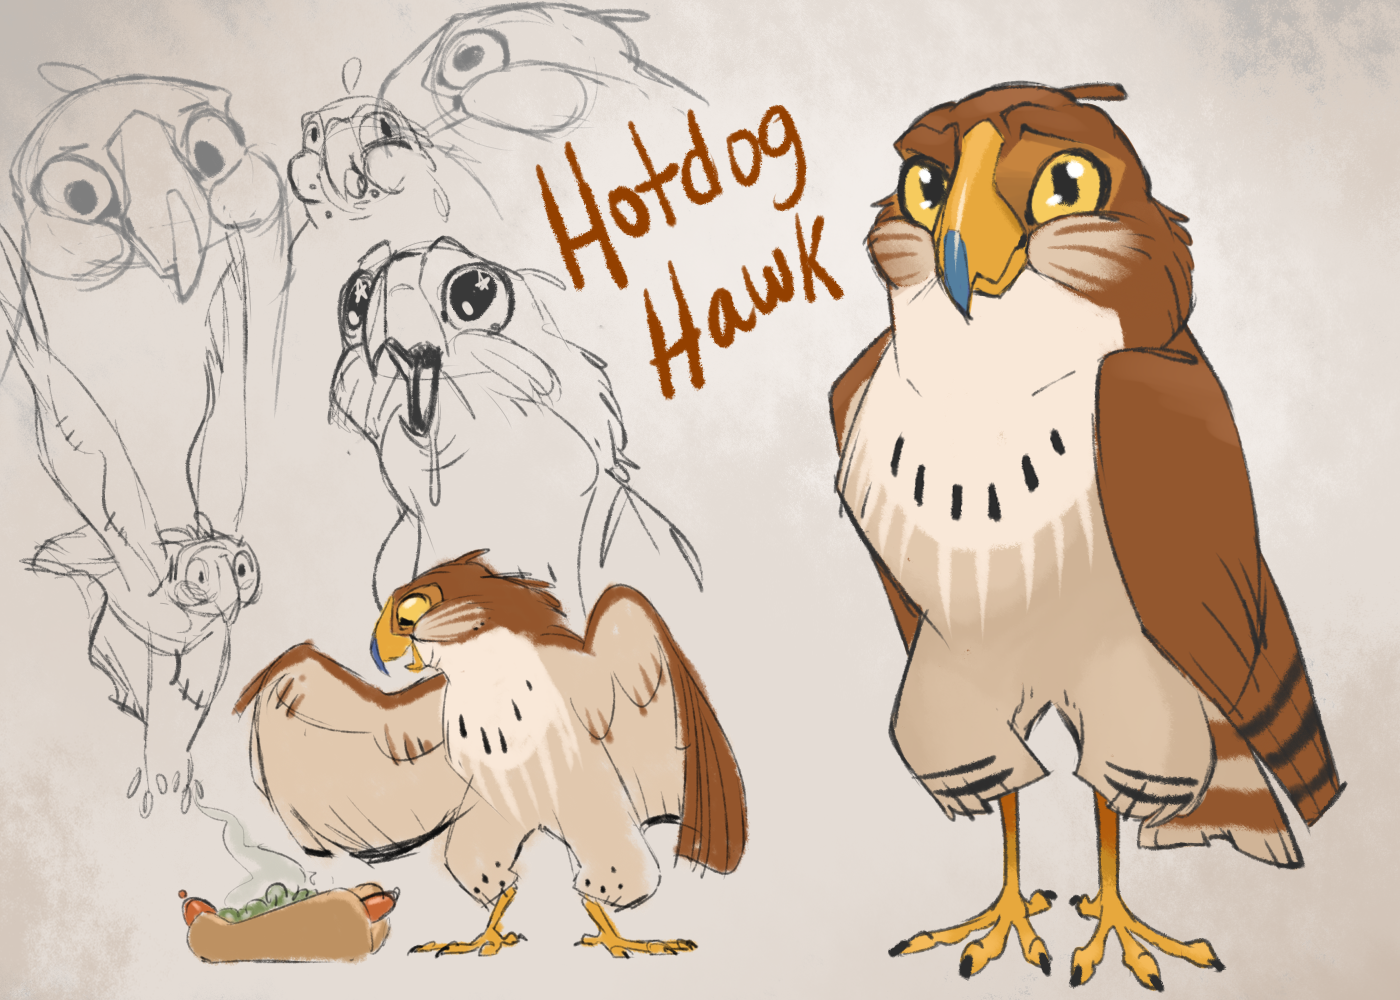 Natasha Soglin's Hotdog Hawk